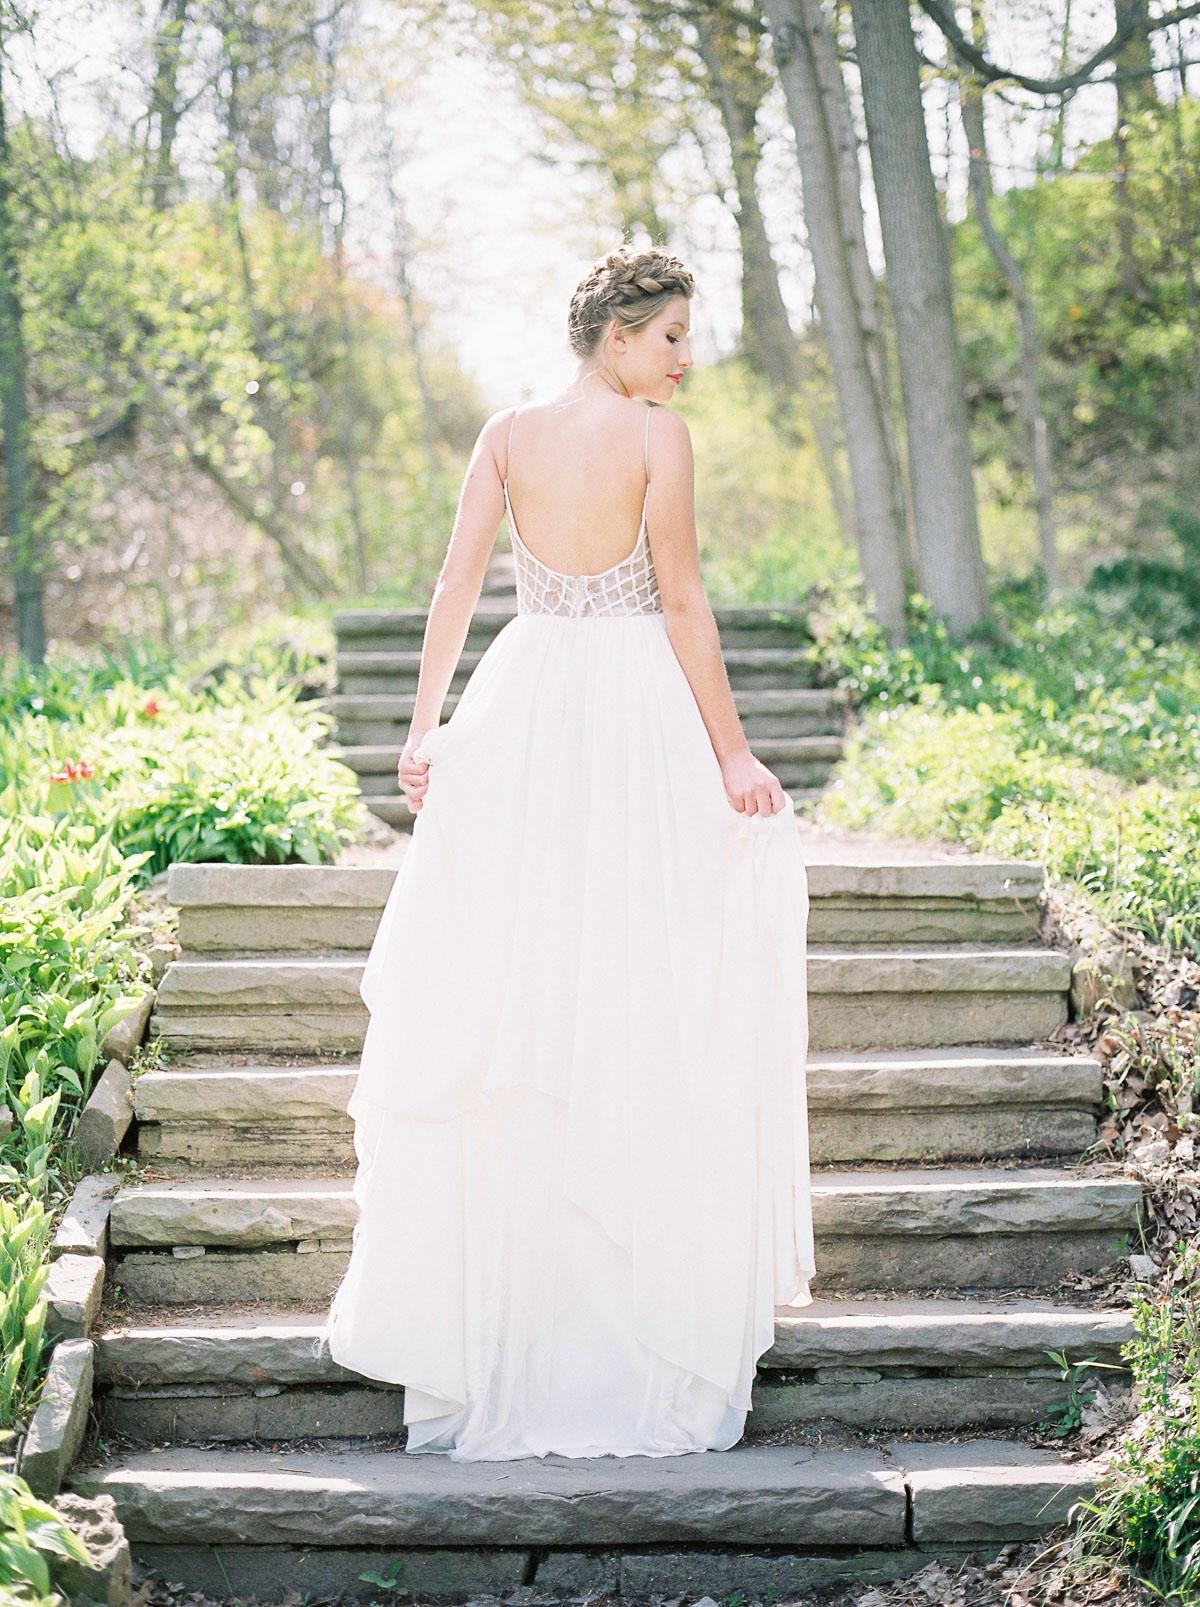 julia-park-photography-vineyard-bride-swish-list-niagara-on-the-lake-wedding-editorial-2.jpg